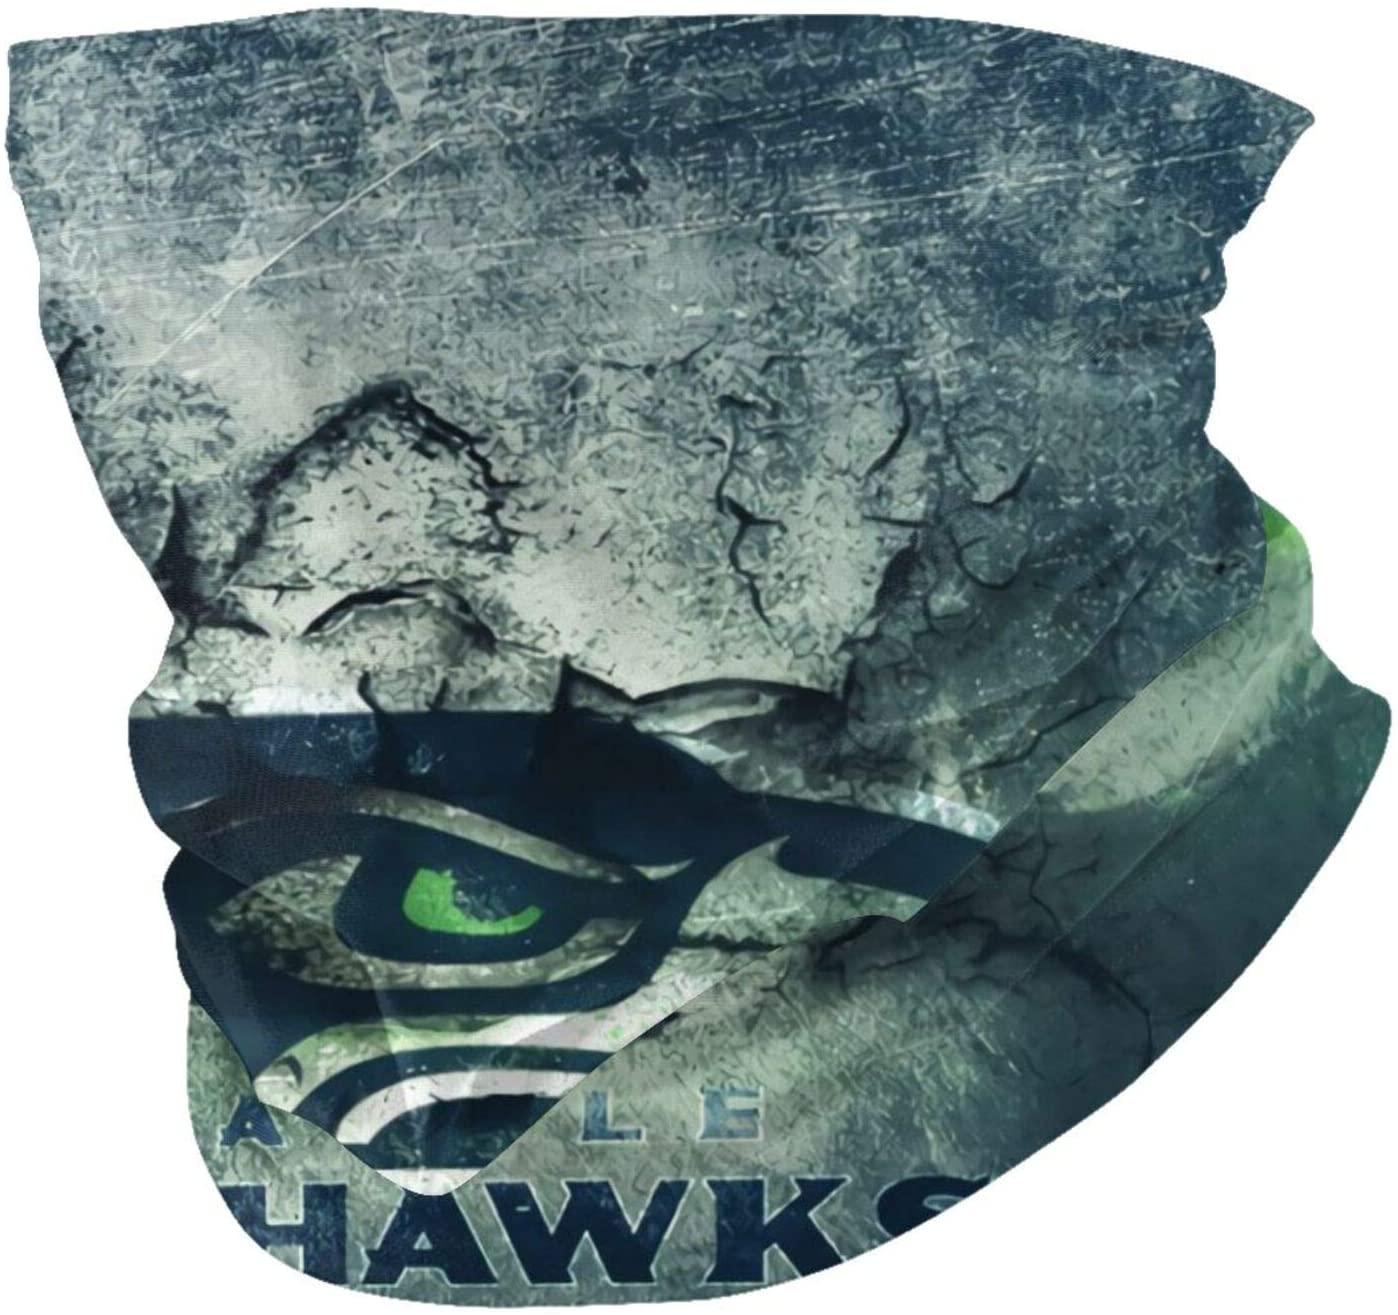 ALHOKLAus Football Seattle Seahawk Neck Gaiter, Variety Face Towel Inner Bag, Face Cover Scarf Protection Neck Have Inner Pockets,Face Mask Inner Bag for Men,Women(2 Packs)